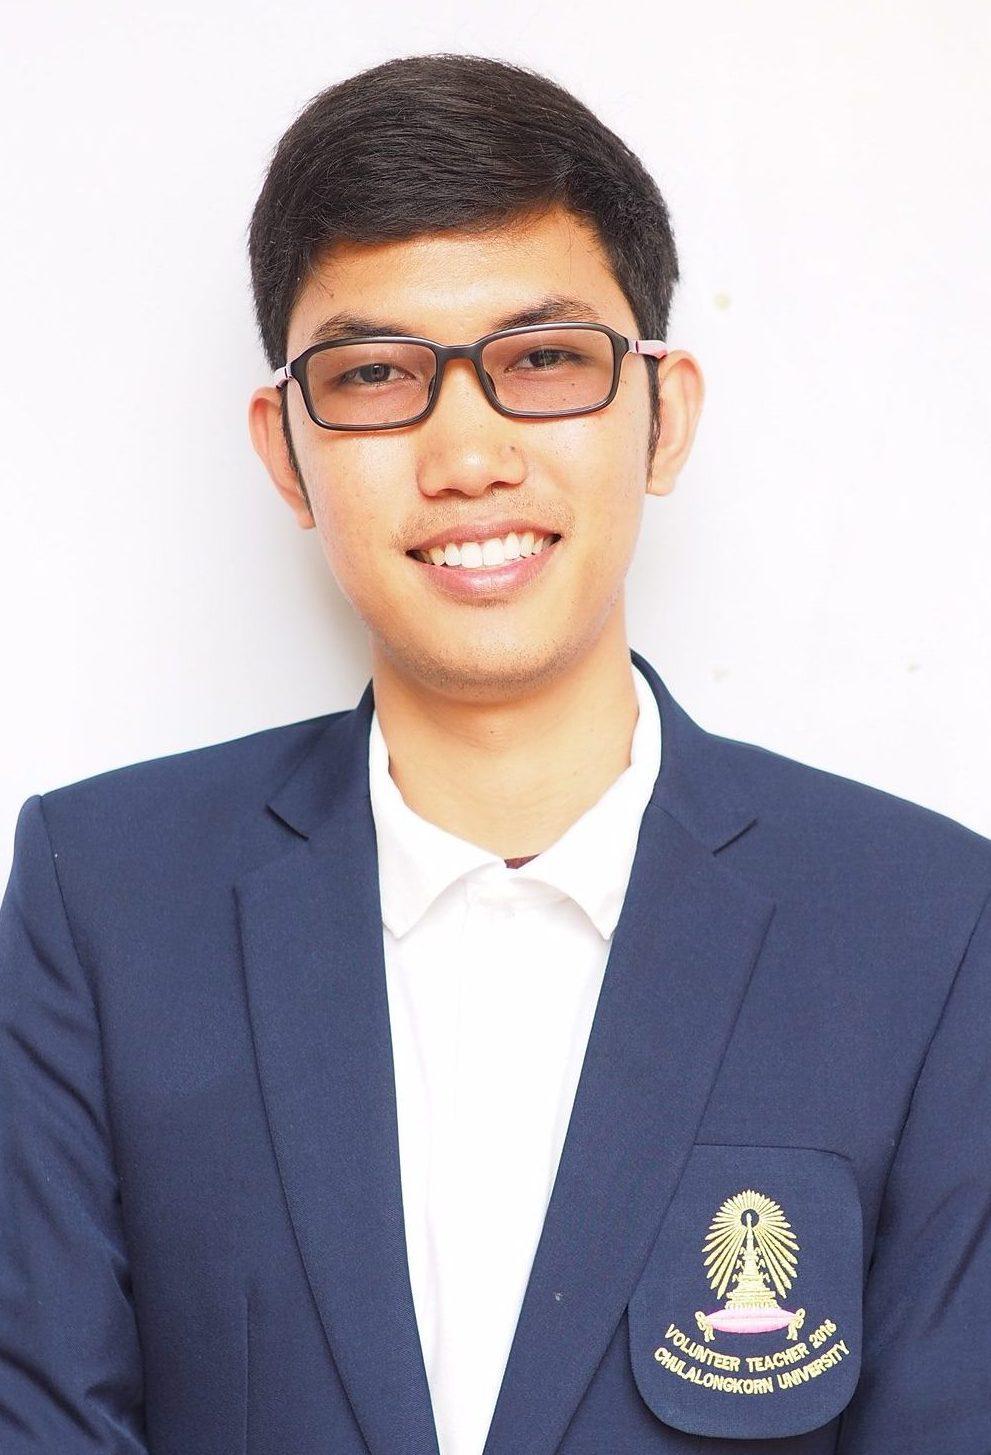 Mr. Benchapoom Thachalad<br>(Kru Ben)<br>Thai Classical Music Class (2019)